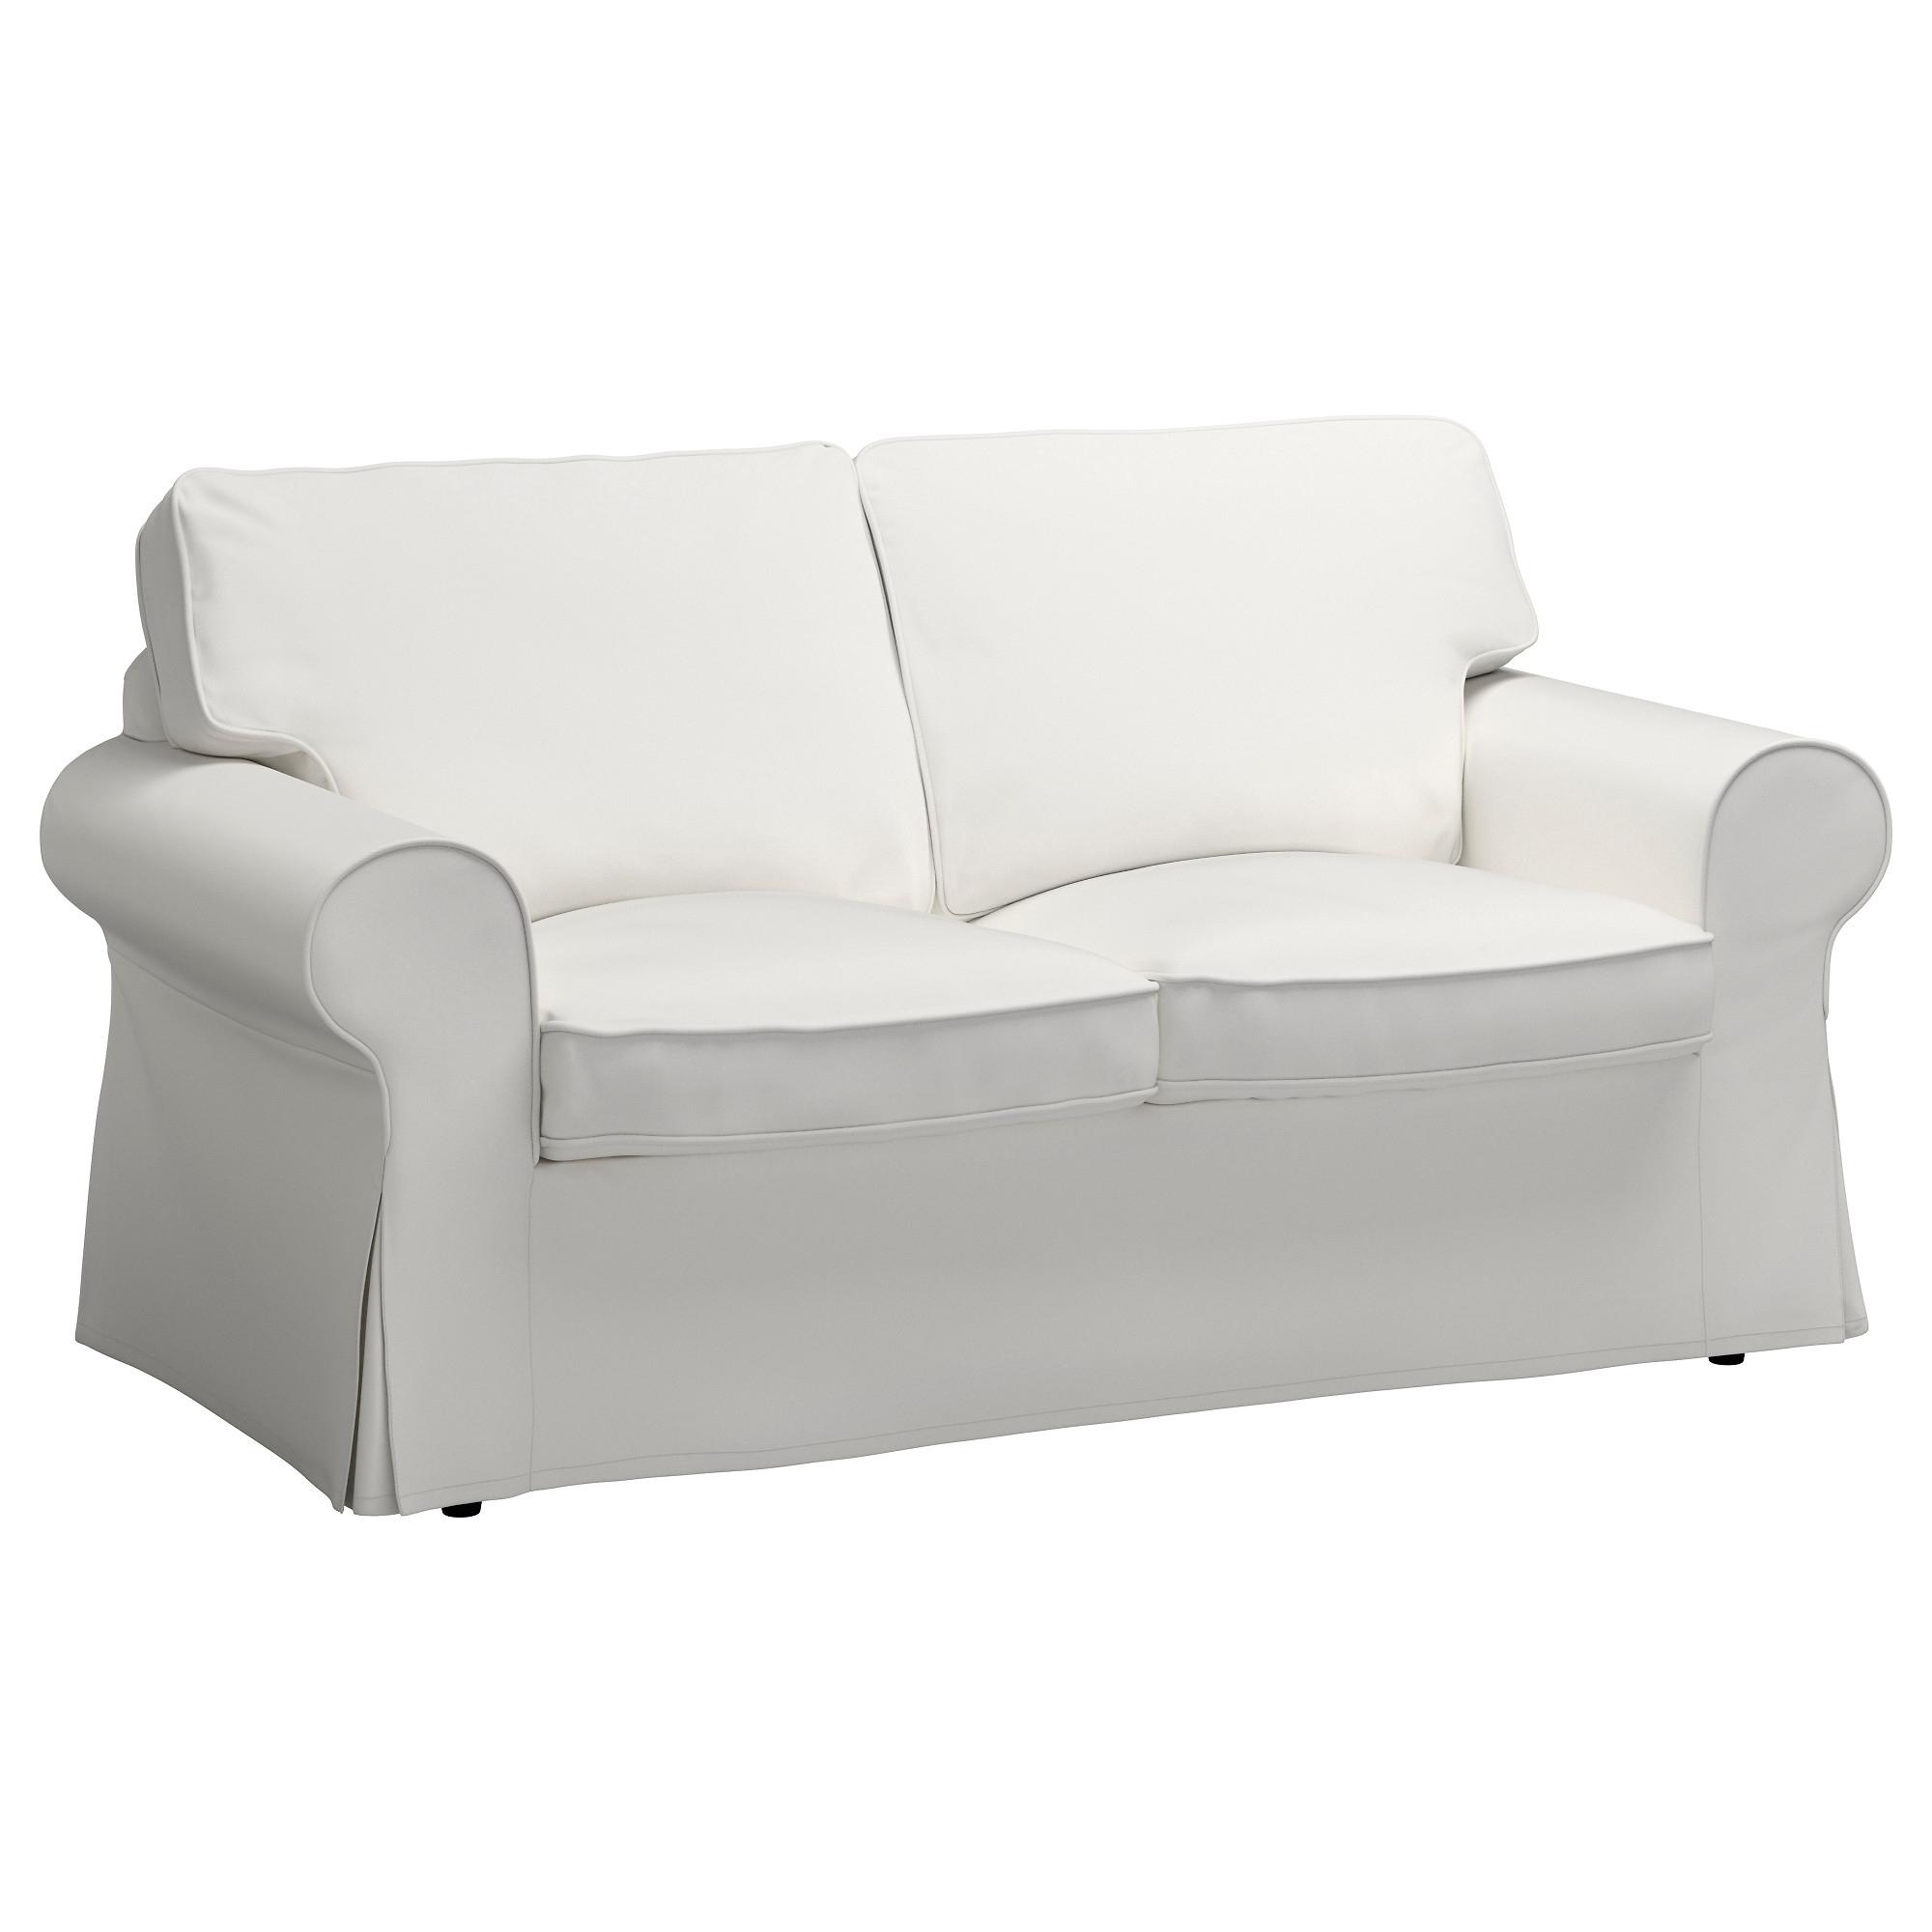 Aifaresidency Throughout Well Known Ikea Loveseat Sleeper Sofas (View 3 of 20)